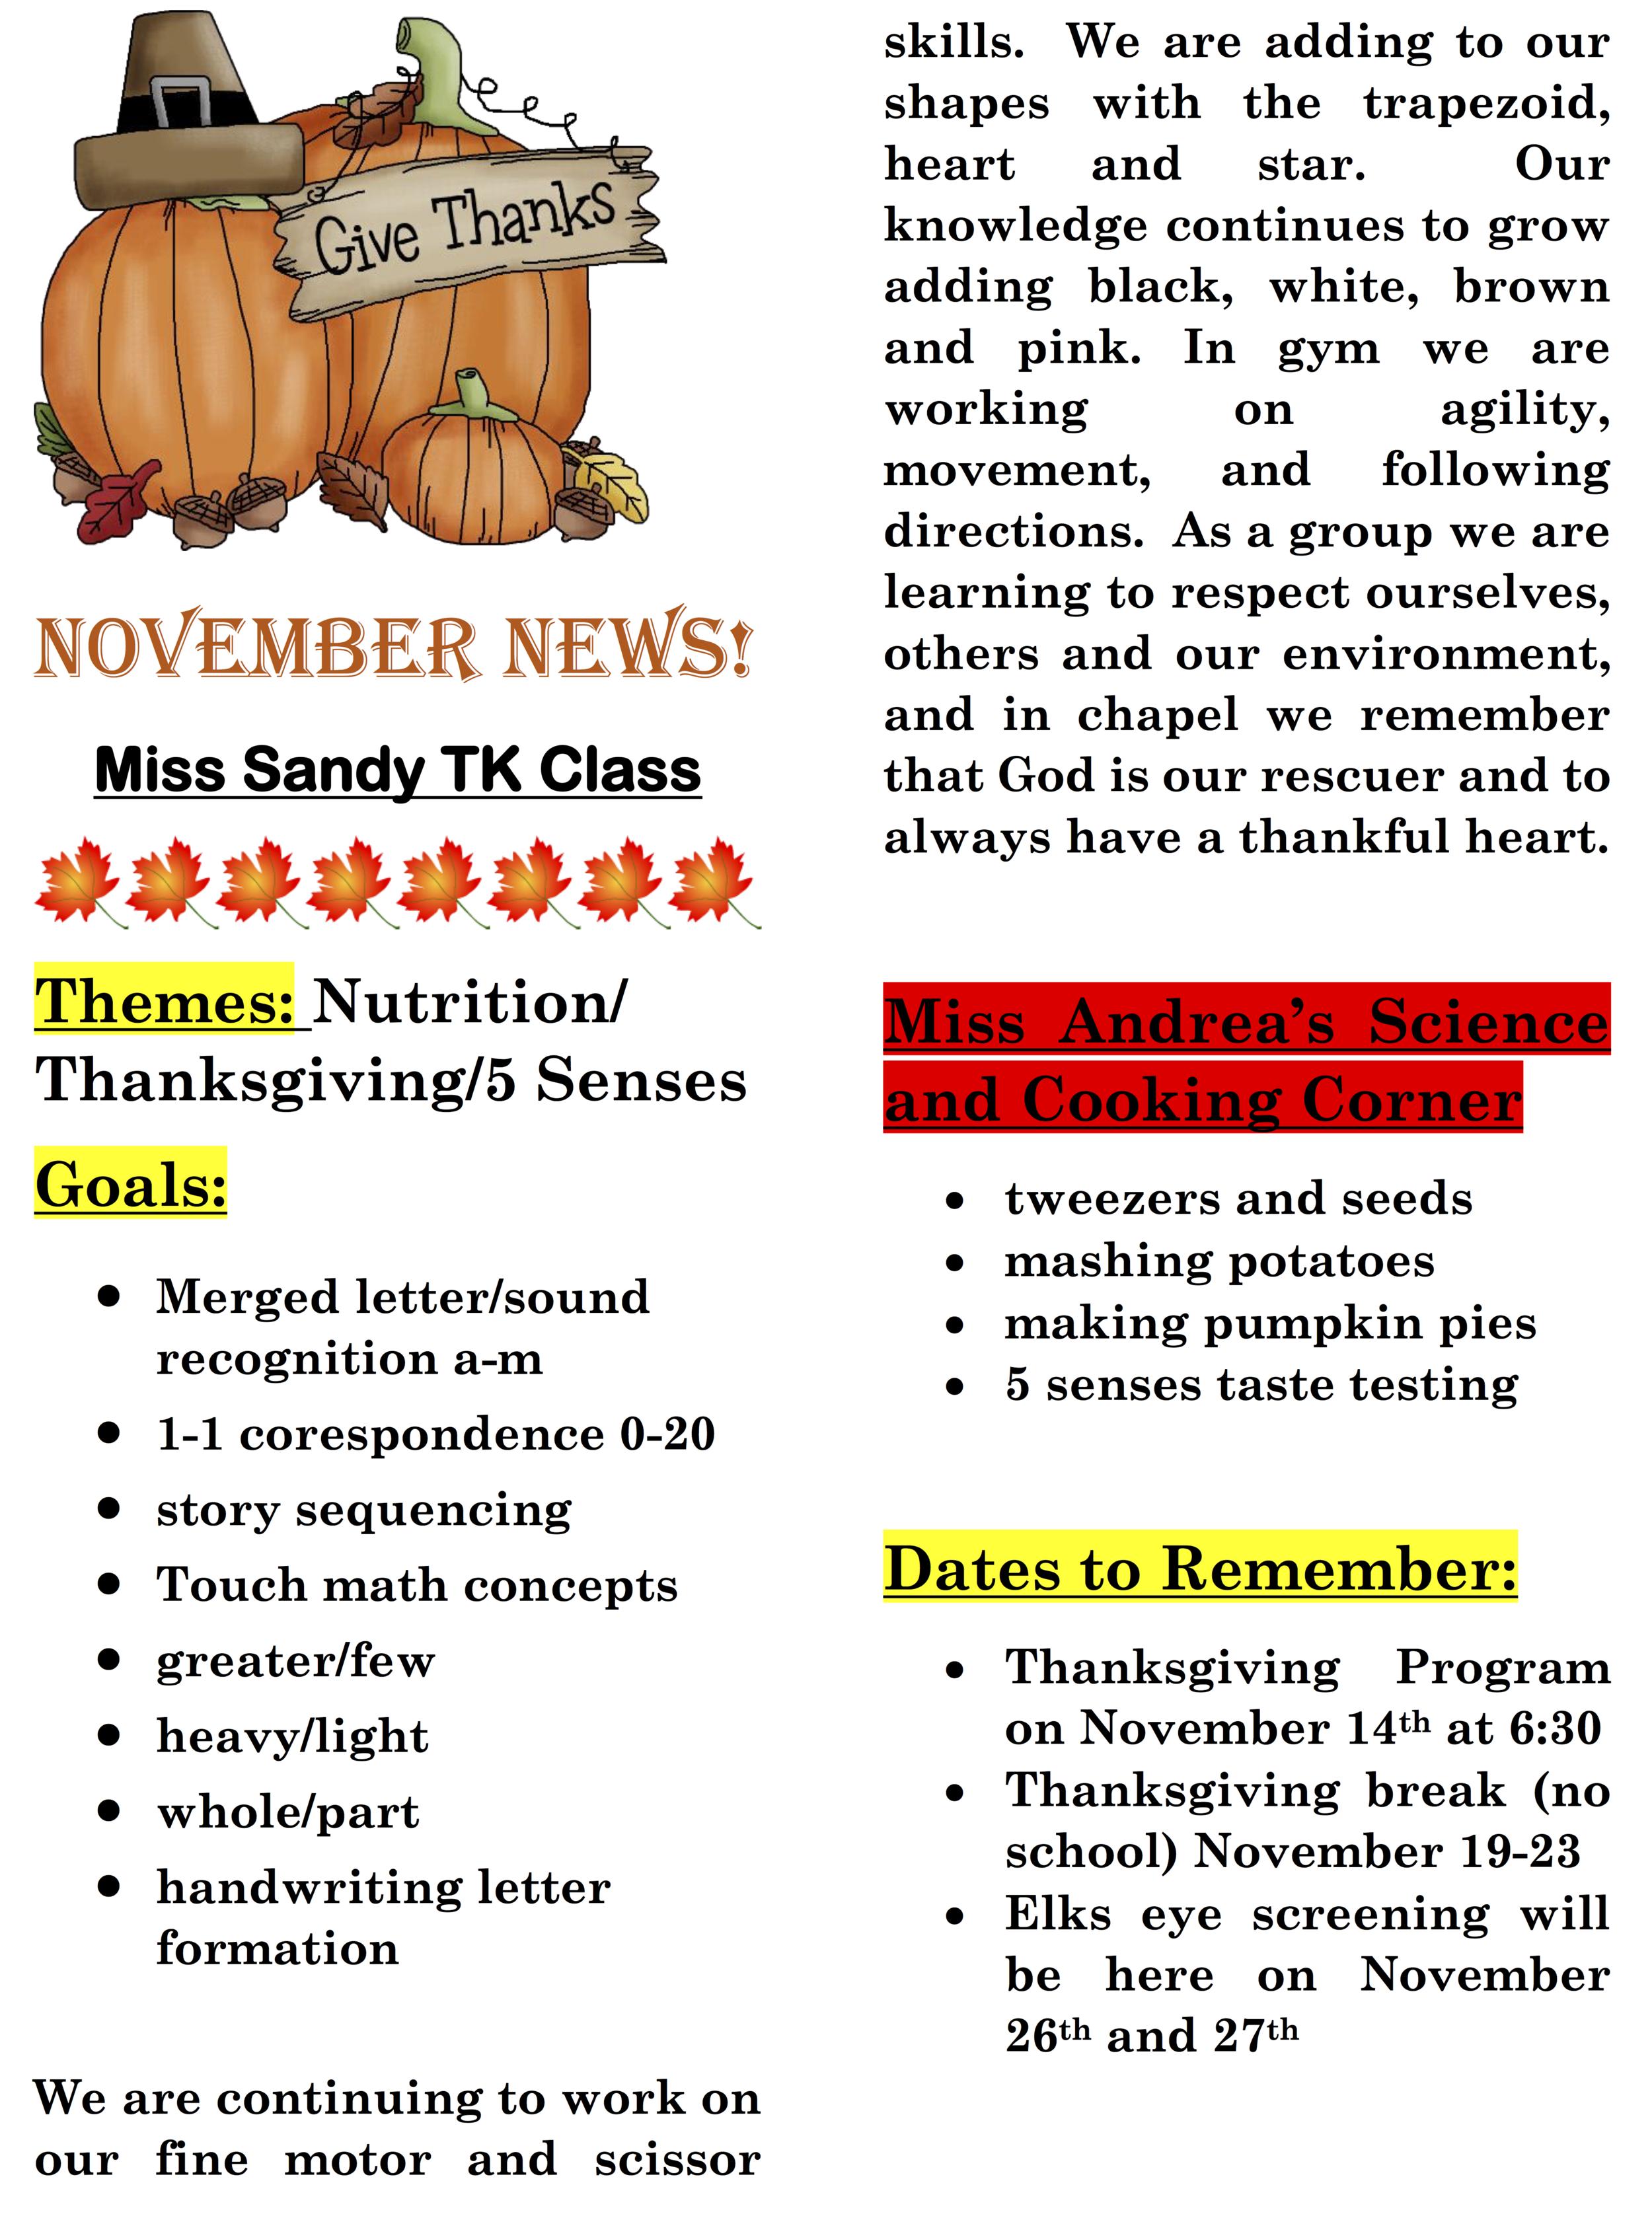 November News Miss Sandy.png